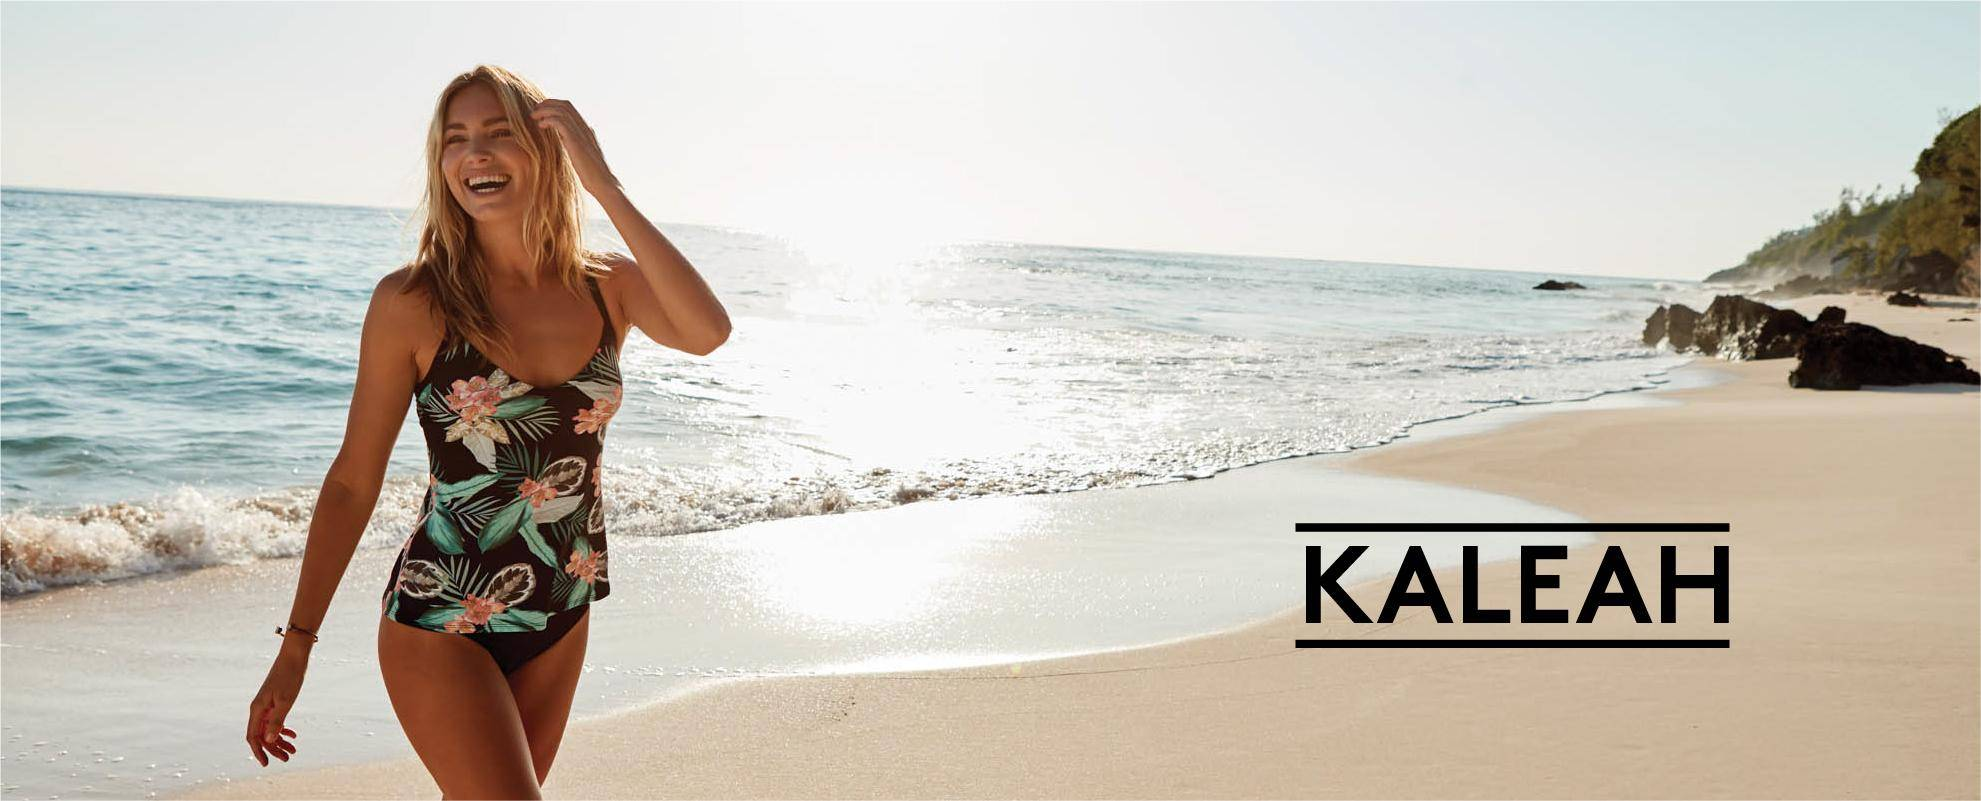 Shop SKYE's Kaleah Collection